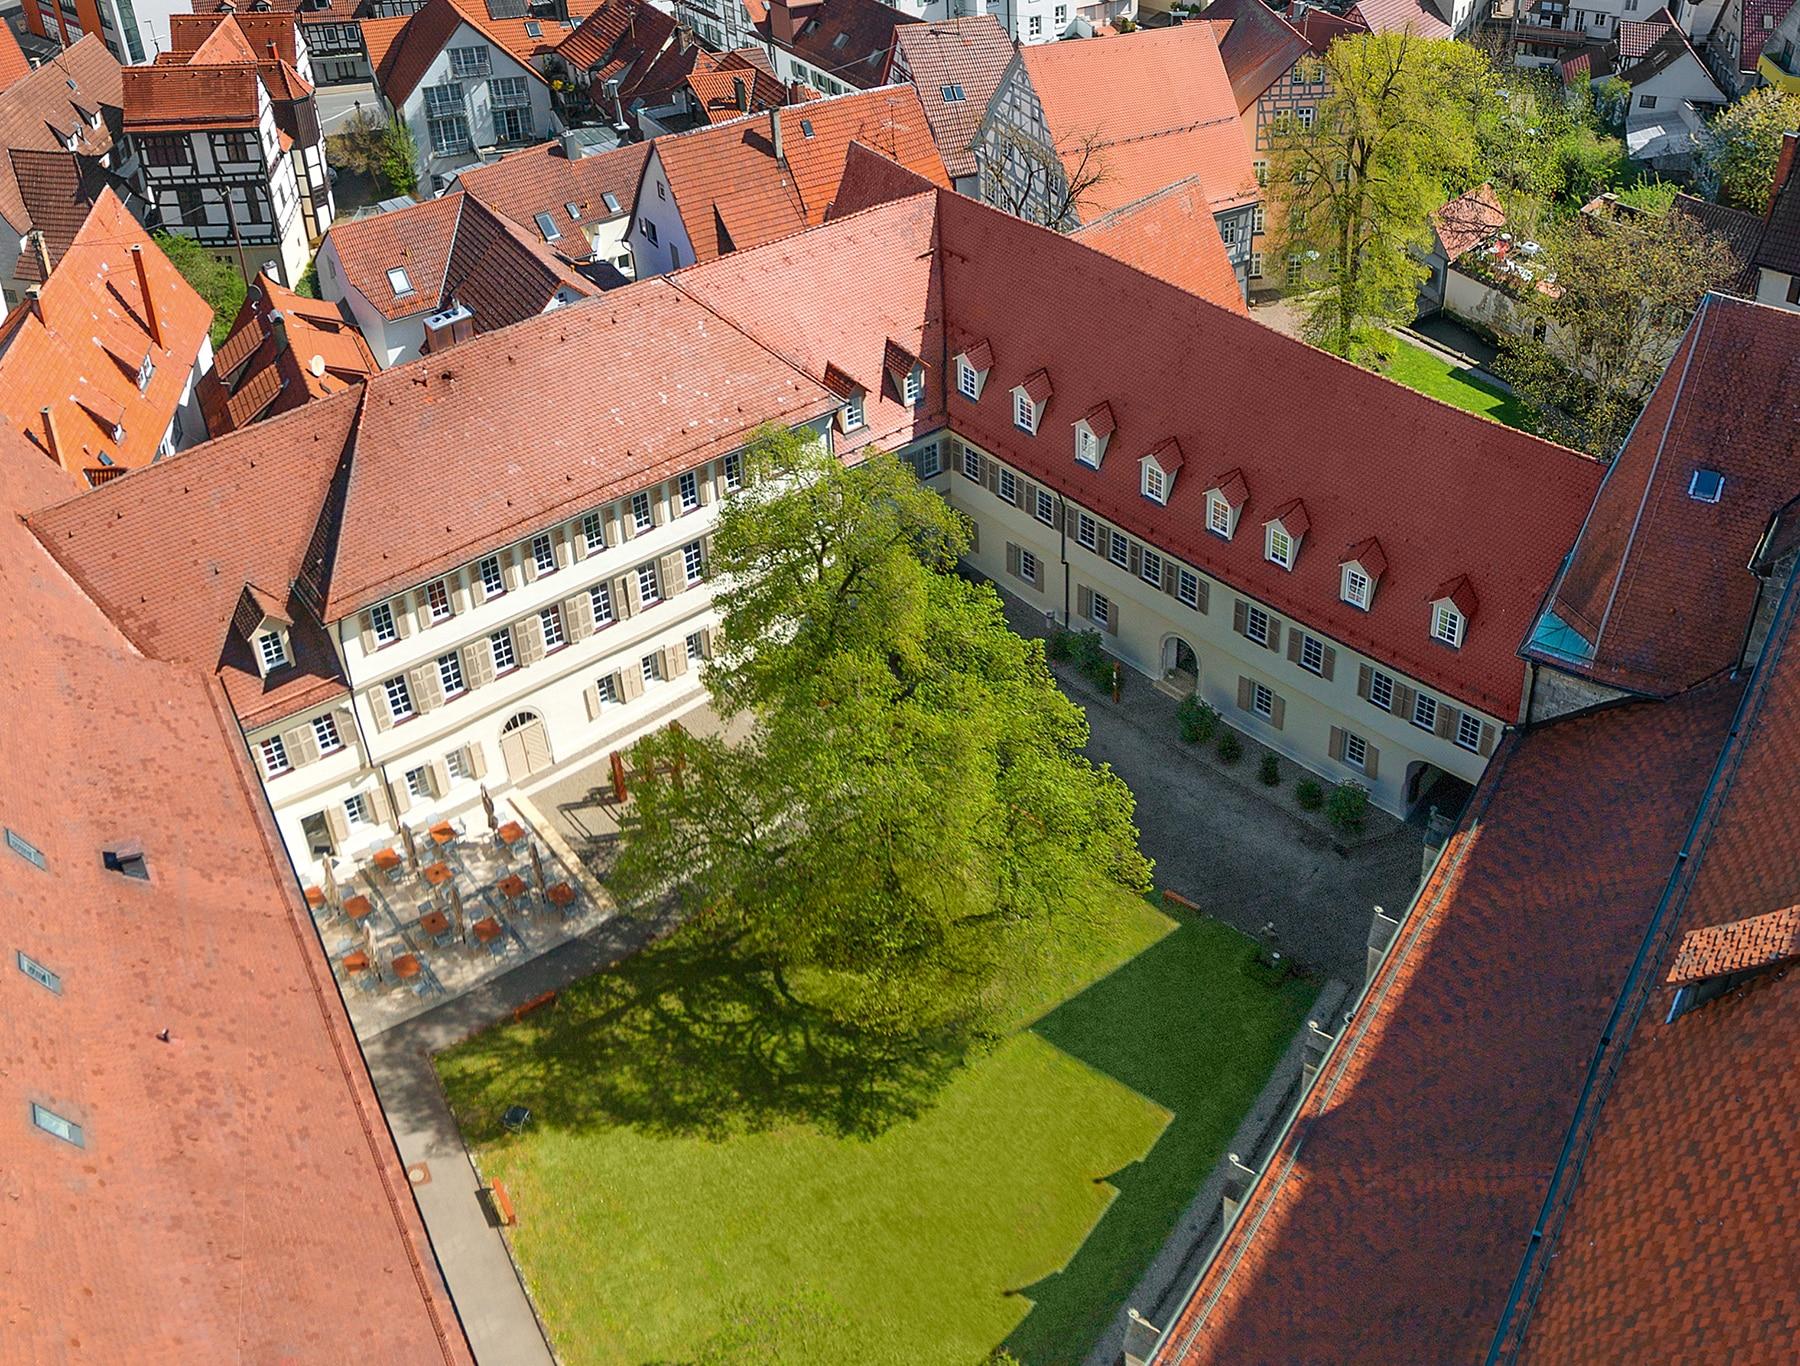 VCH Einkehrhaus Stift Urach Turmblick